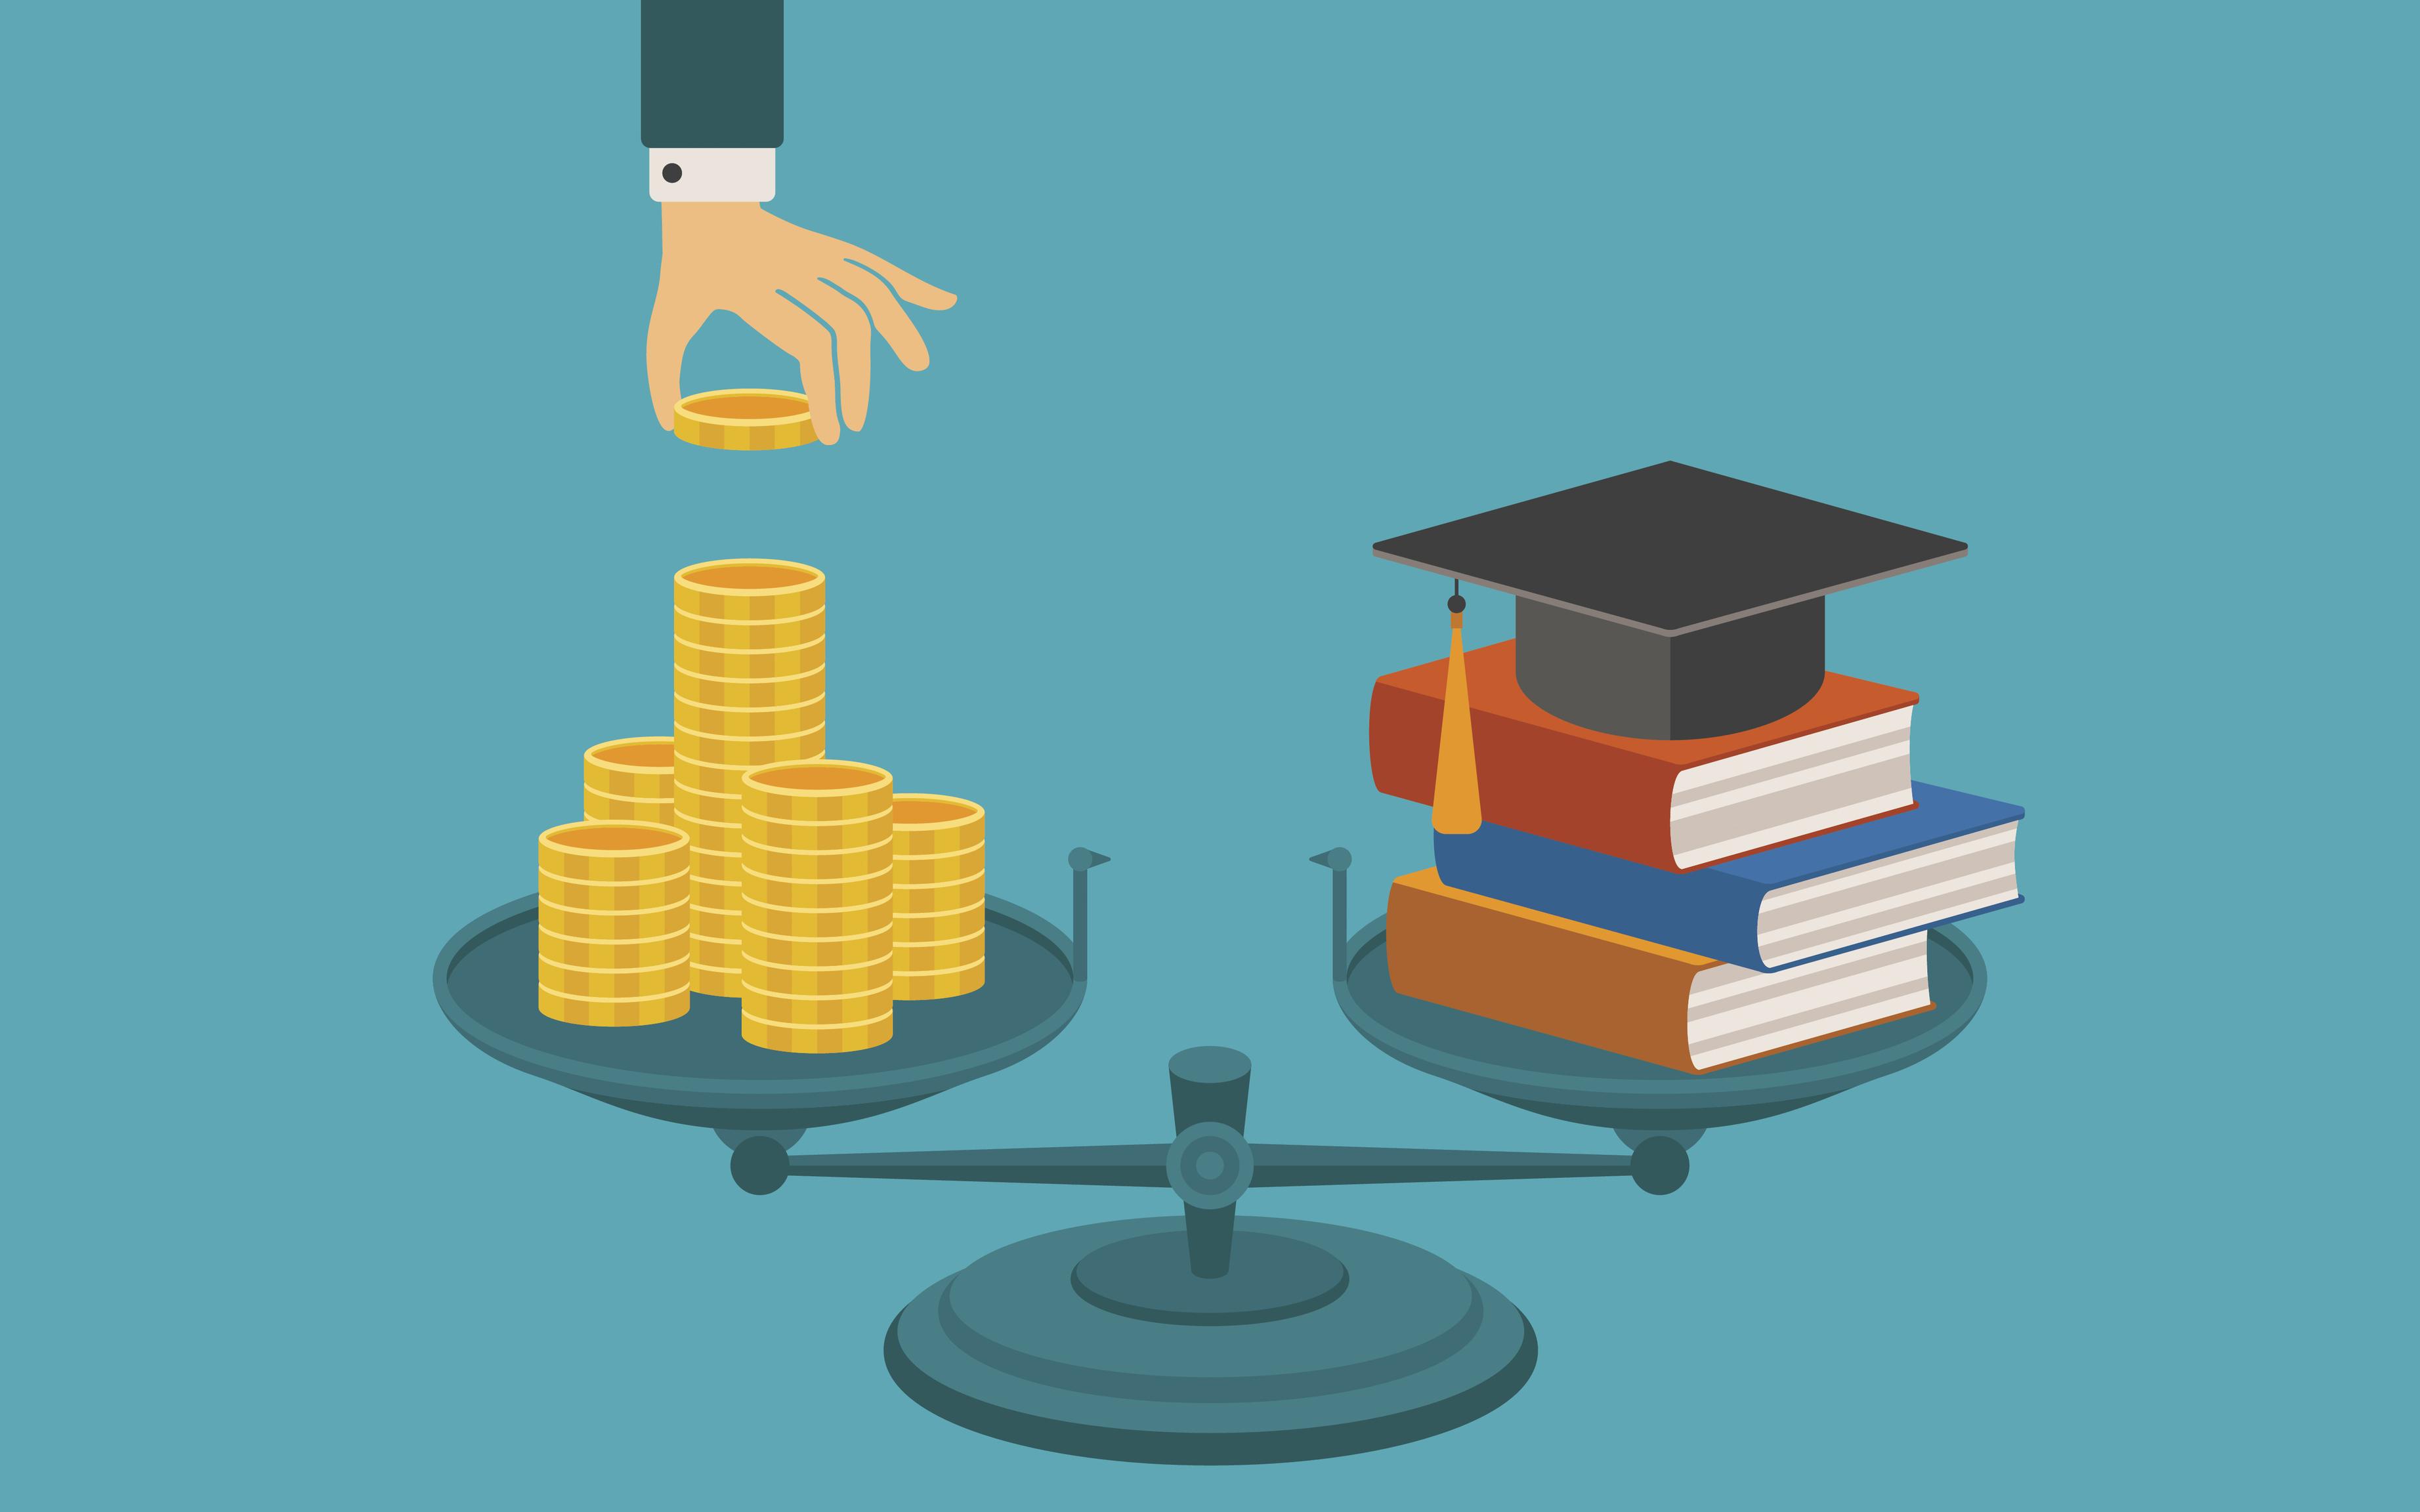 Naukri parent Info Edge invests more in BigStylist, backs B2B startup Wishbook